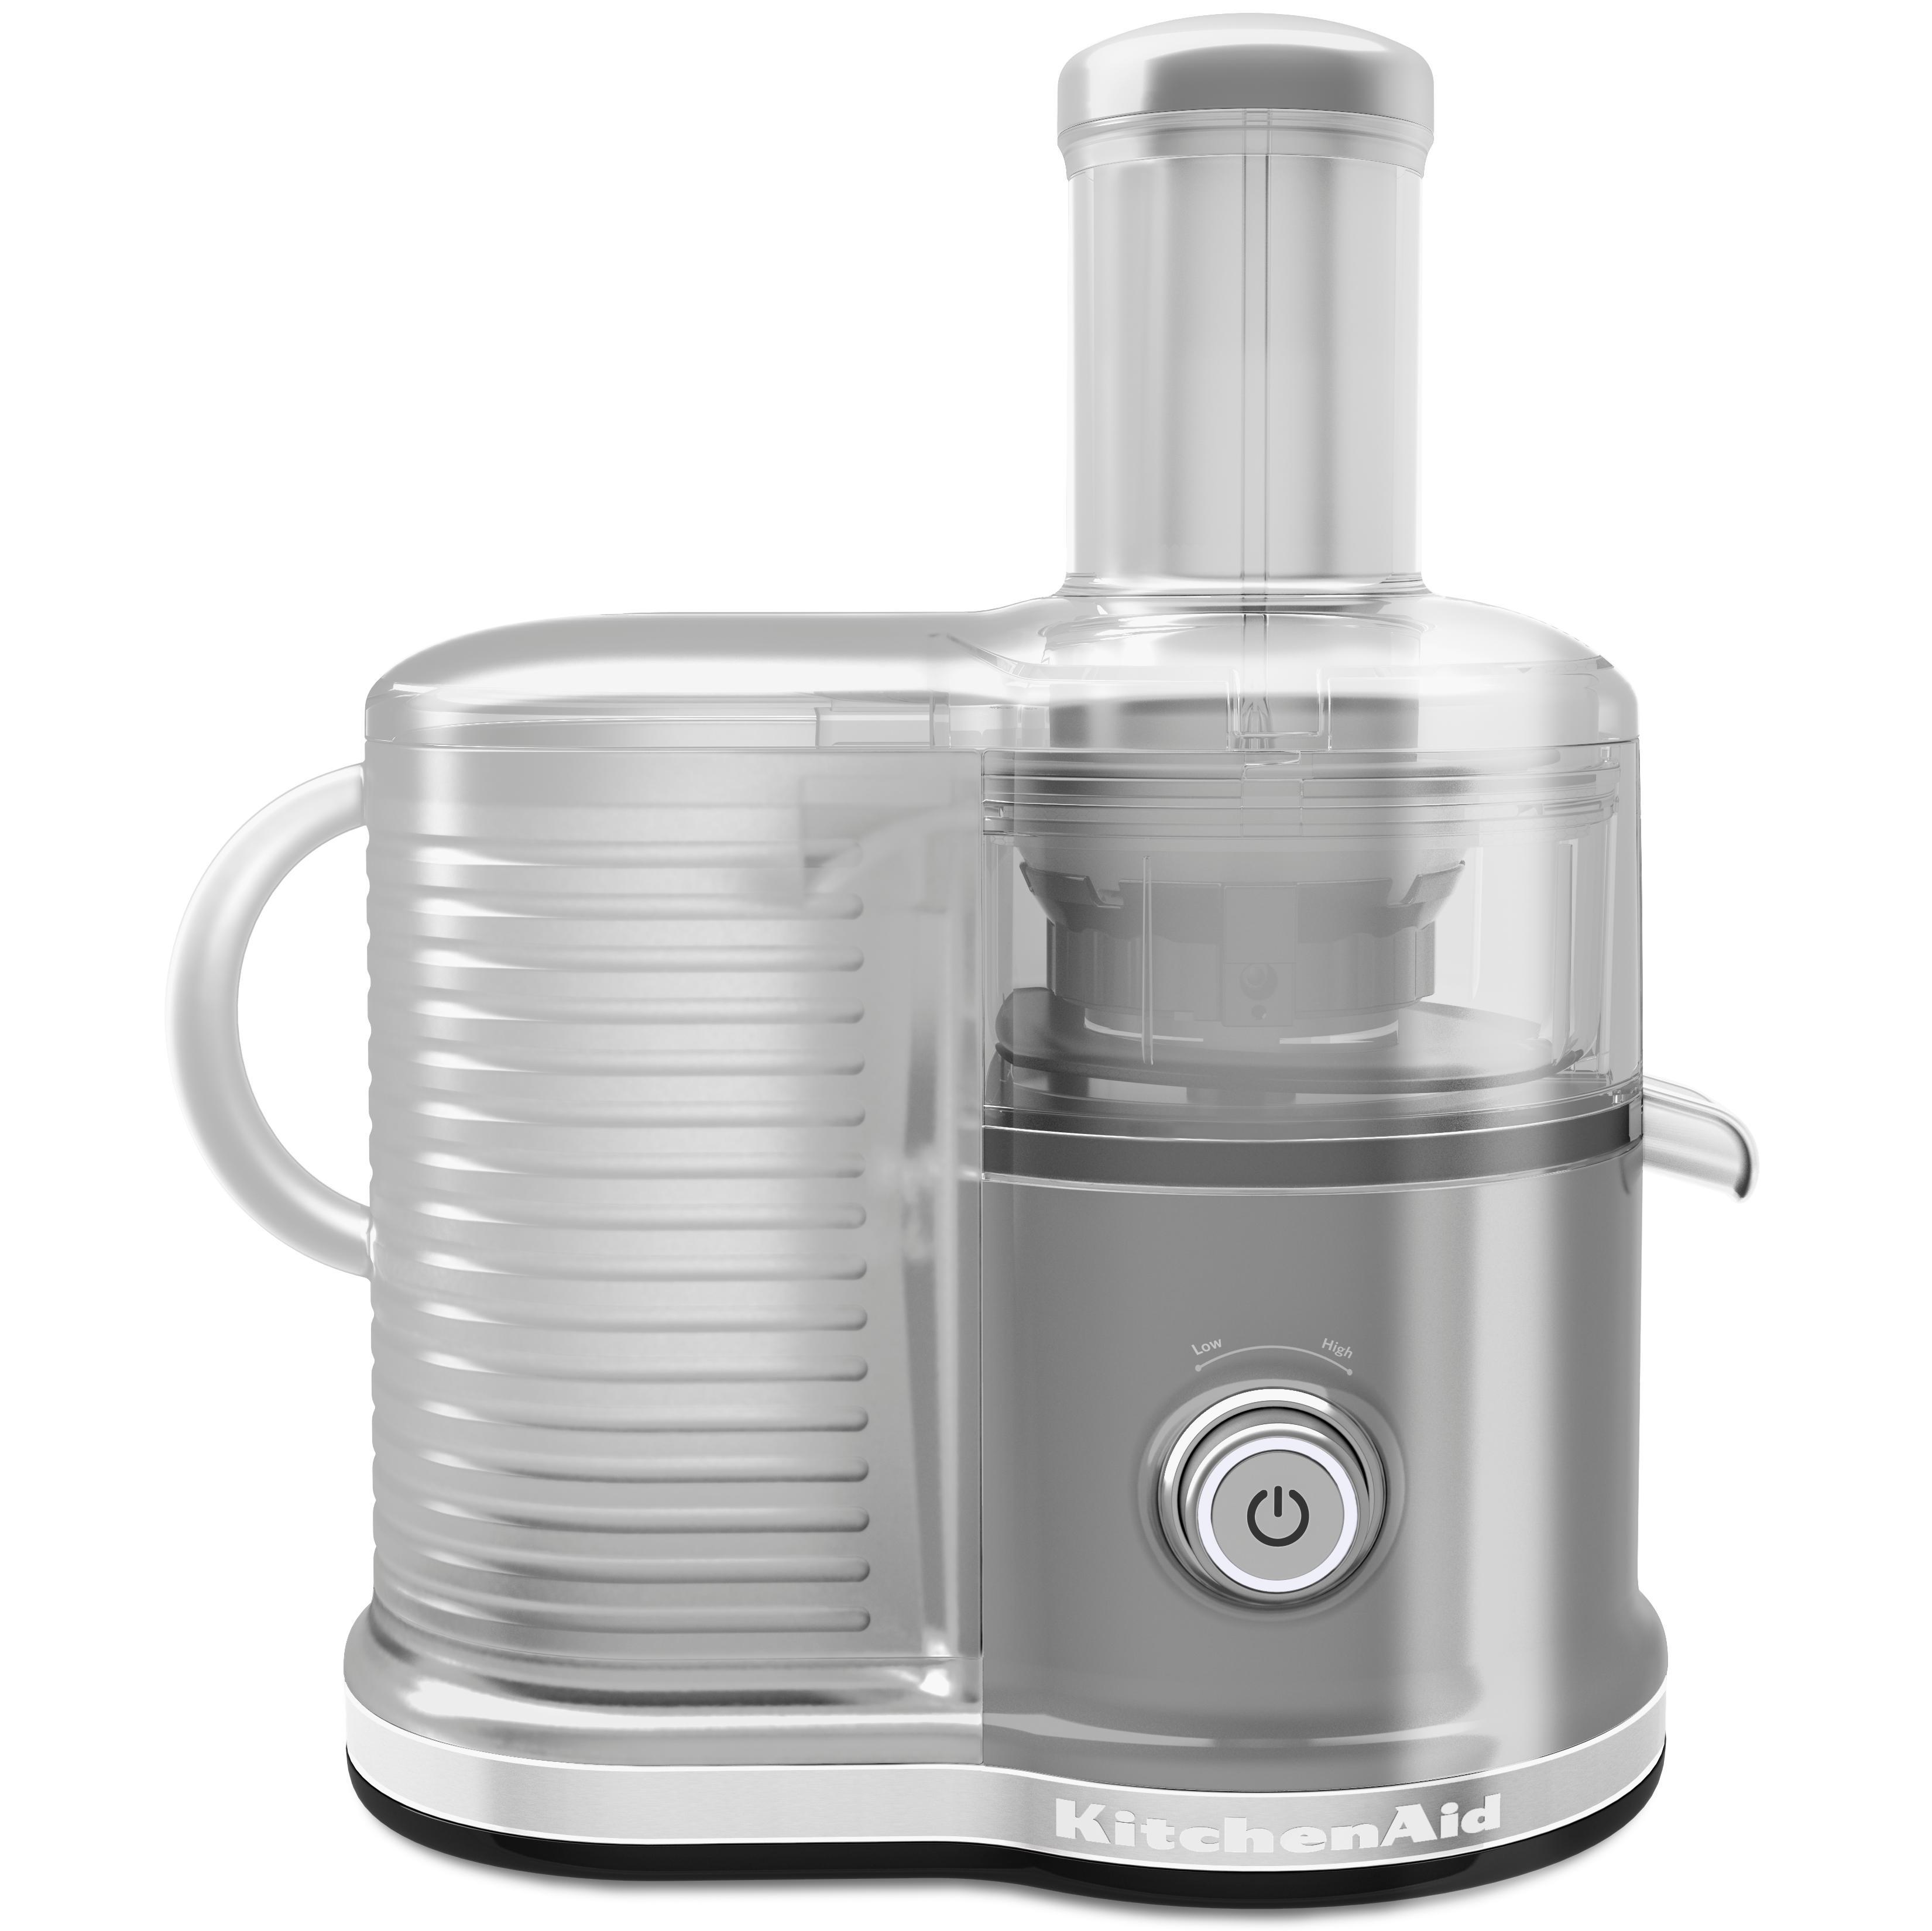 Amazon.com: KitchenAid KVJ0333CU Easy Clean Juicer, Contour Silver ...